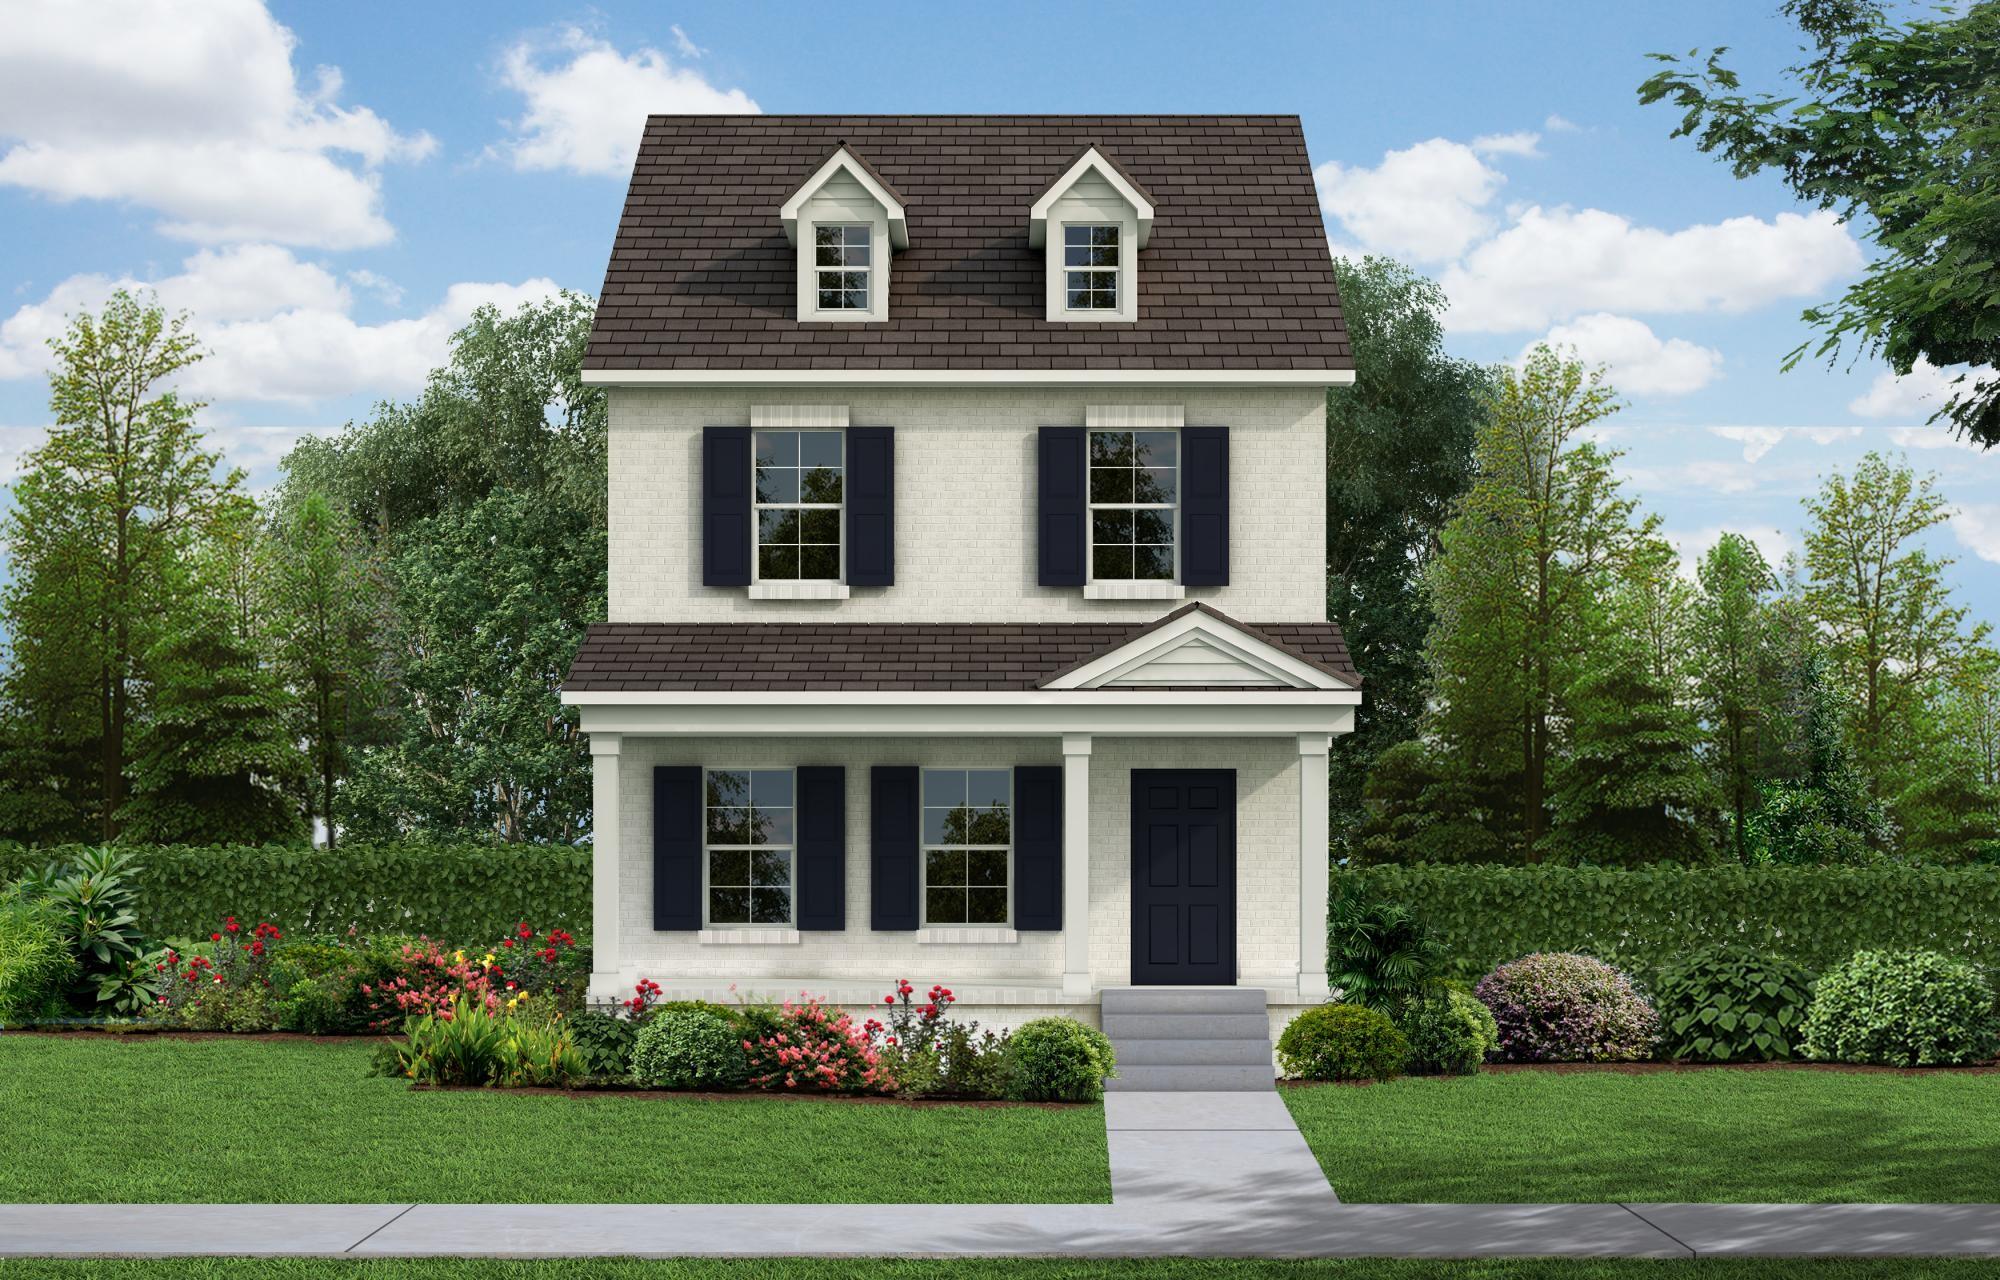 277 Cloverbrook Way (CC424), Gallatin, TN 37066 - Gallatin, TN real estate listing